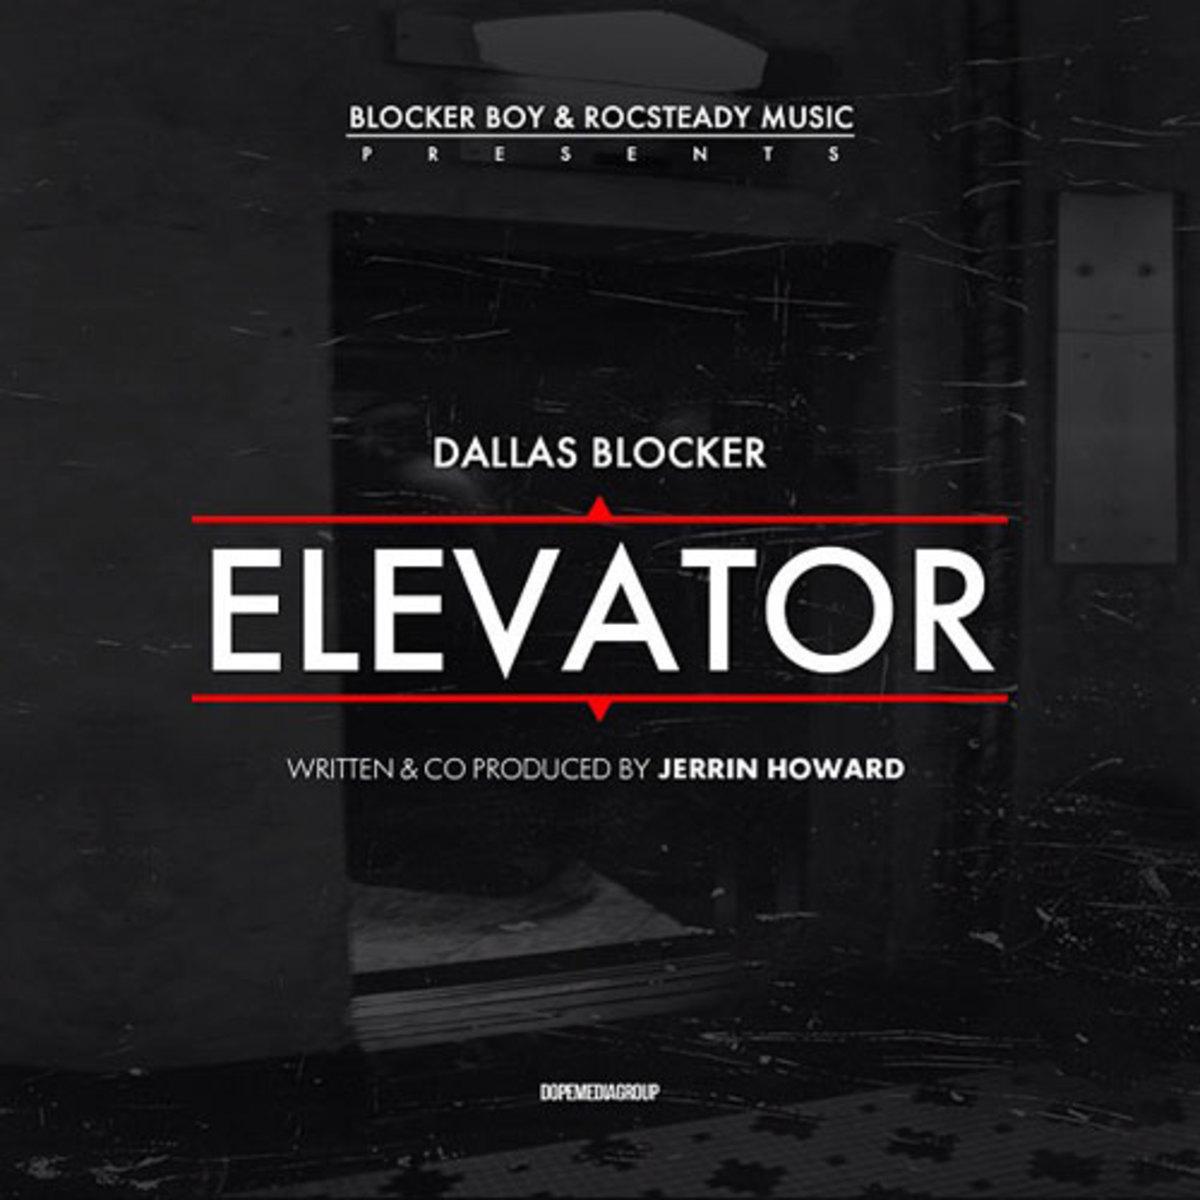 dallasblocker-elevator.jpg